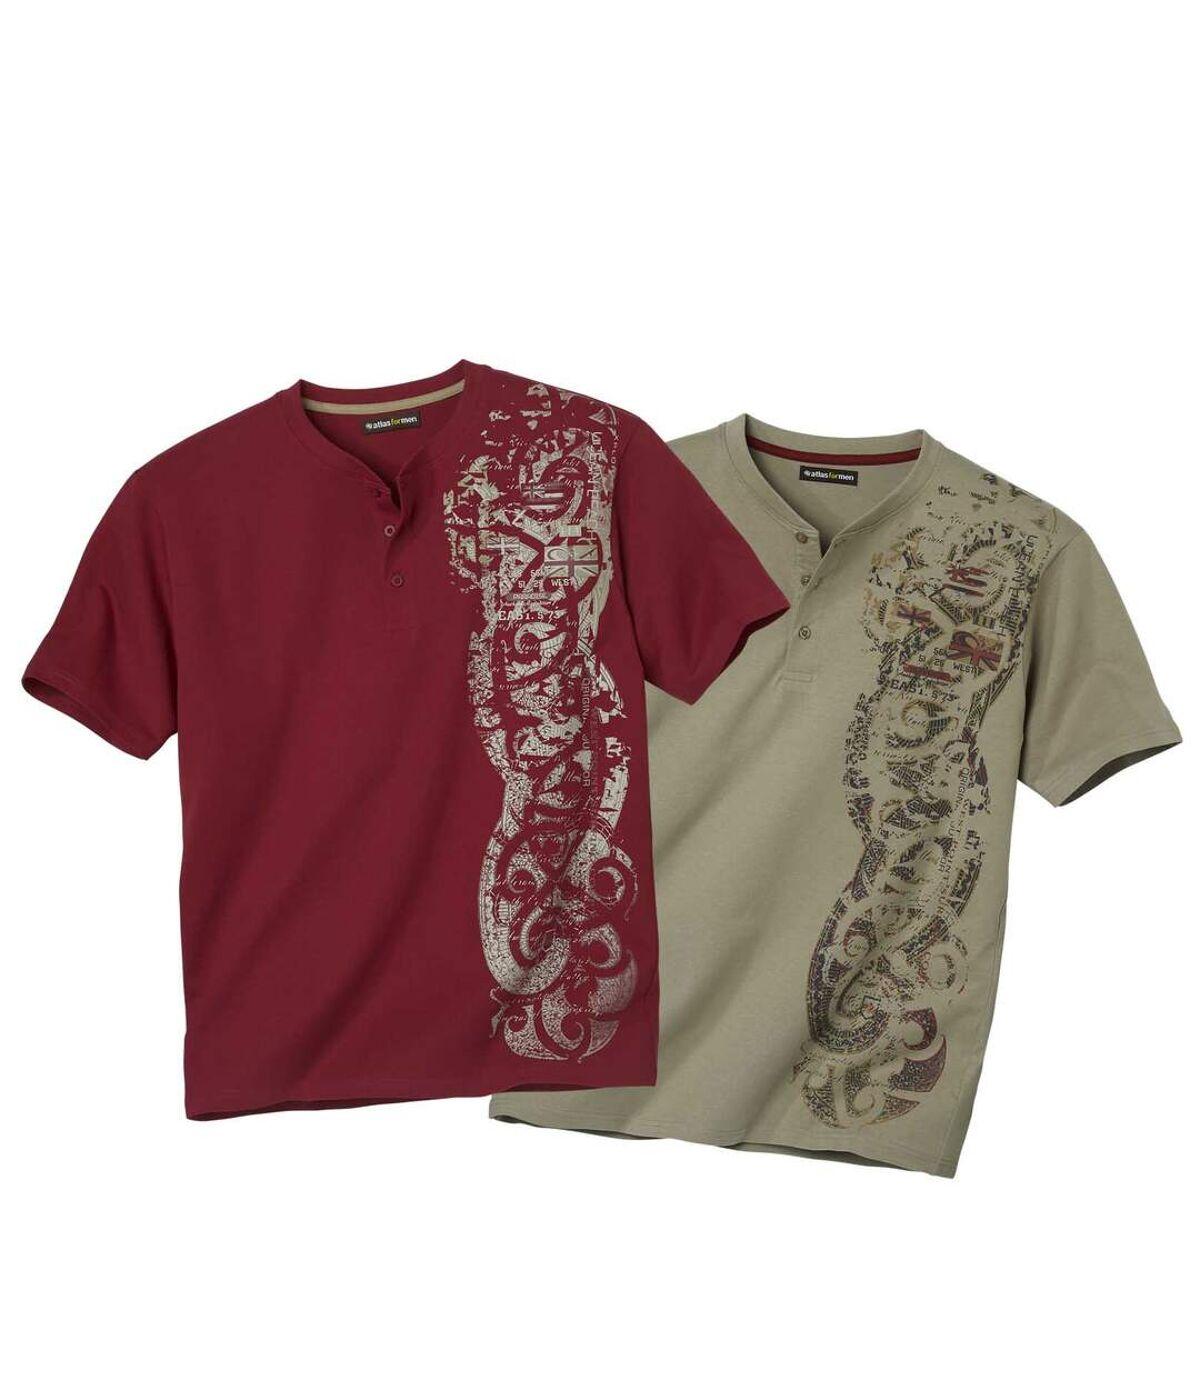 Sada 2 triček Maori s knoflíčkovým zapínáním u krku Atlas For Men